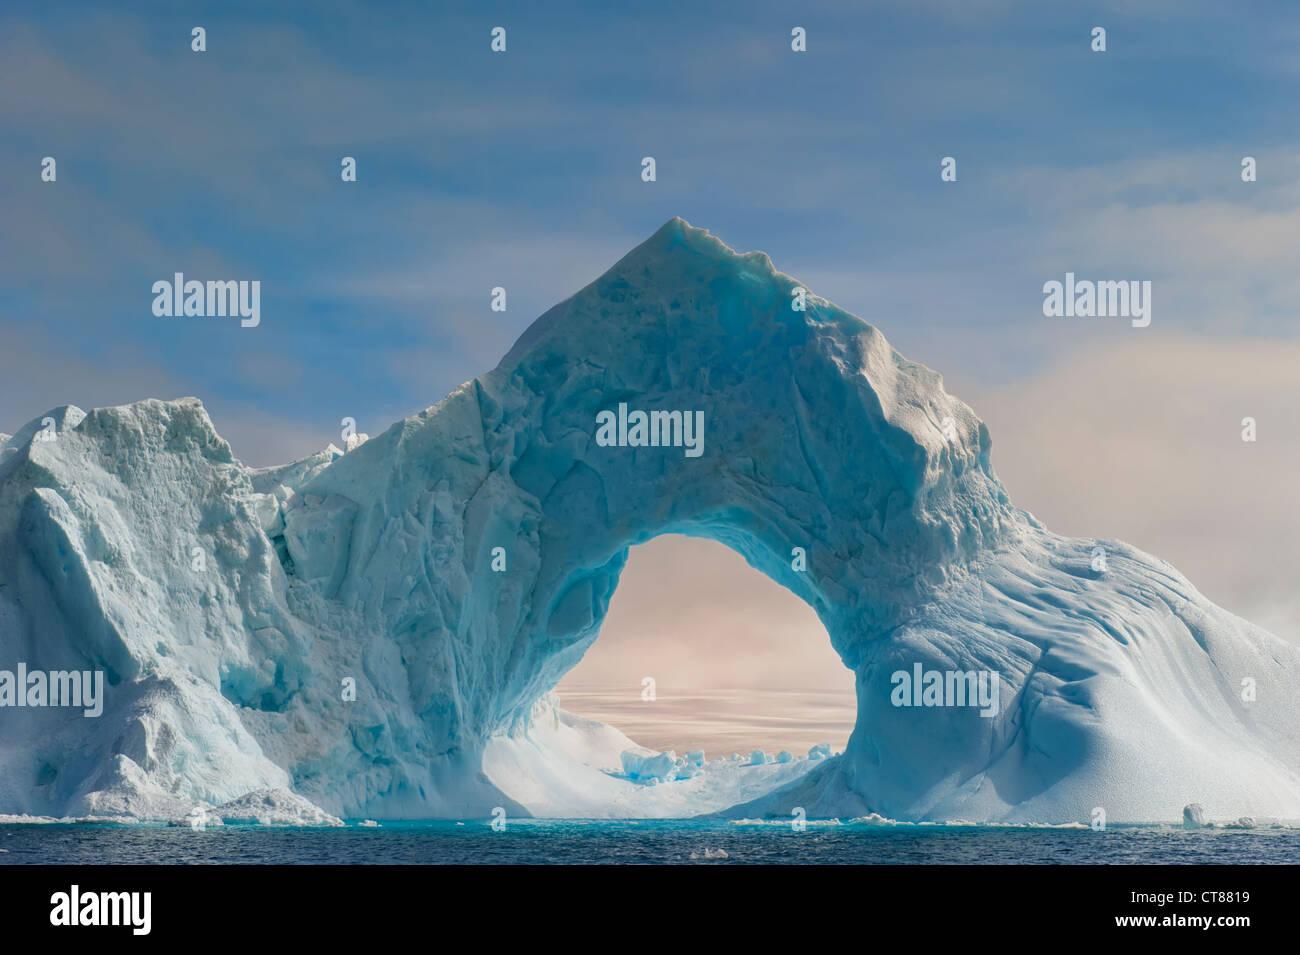 Arco Natural tallada en un iceberg, el Antarctic Sound, Península Antártica. Foto de stock